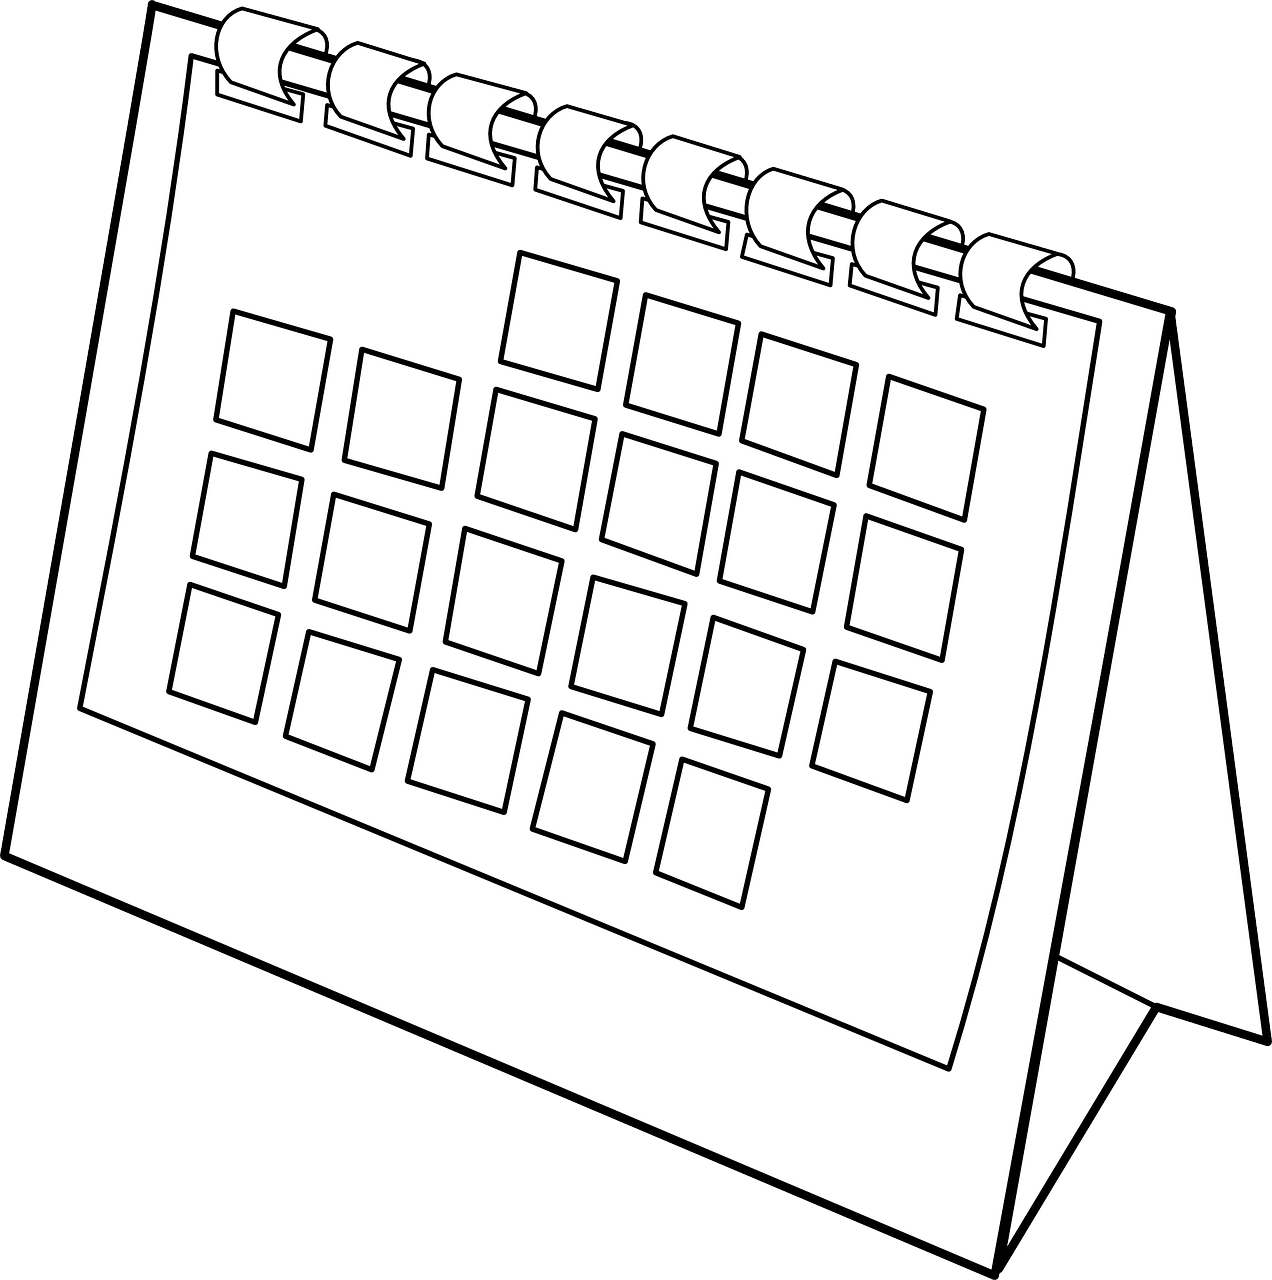 Agenda book clipart banner black and white Directory /images/clip-art banner black and white